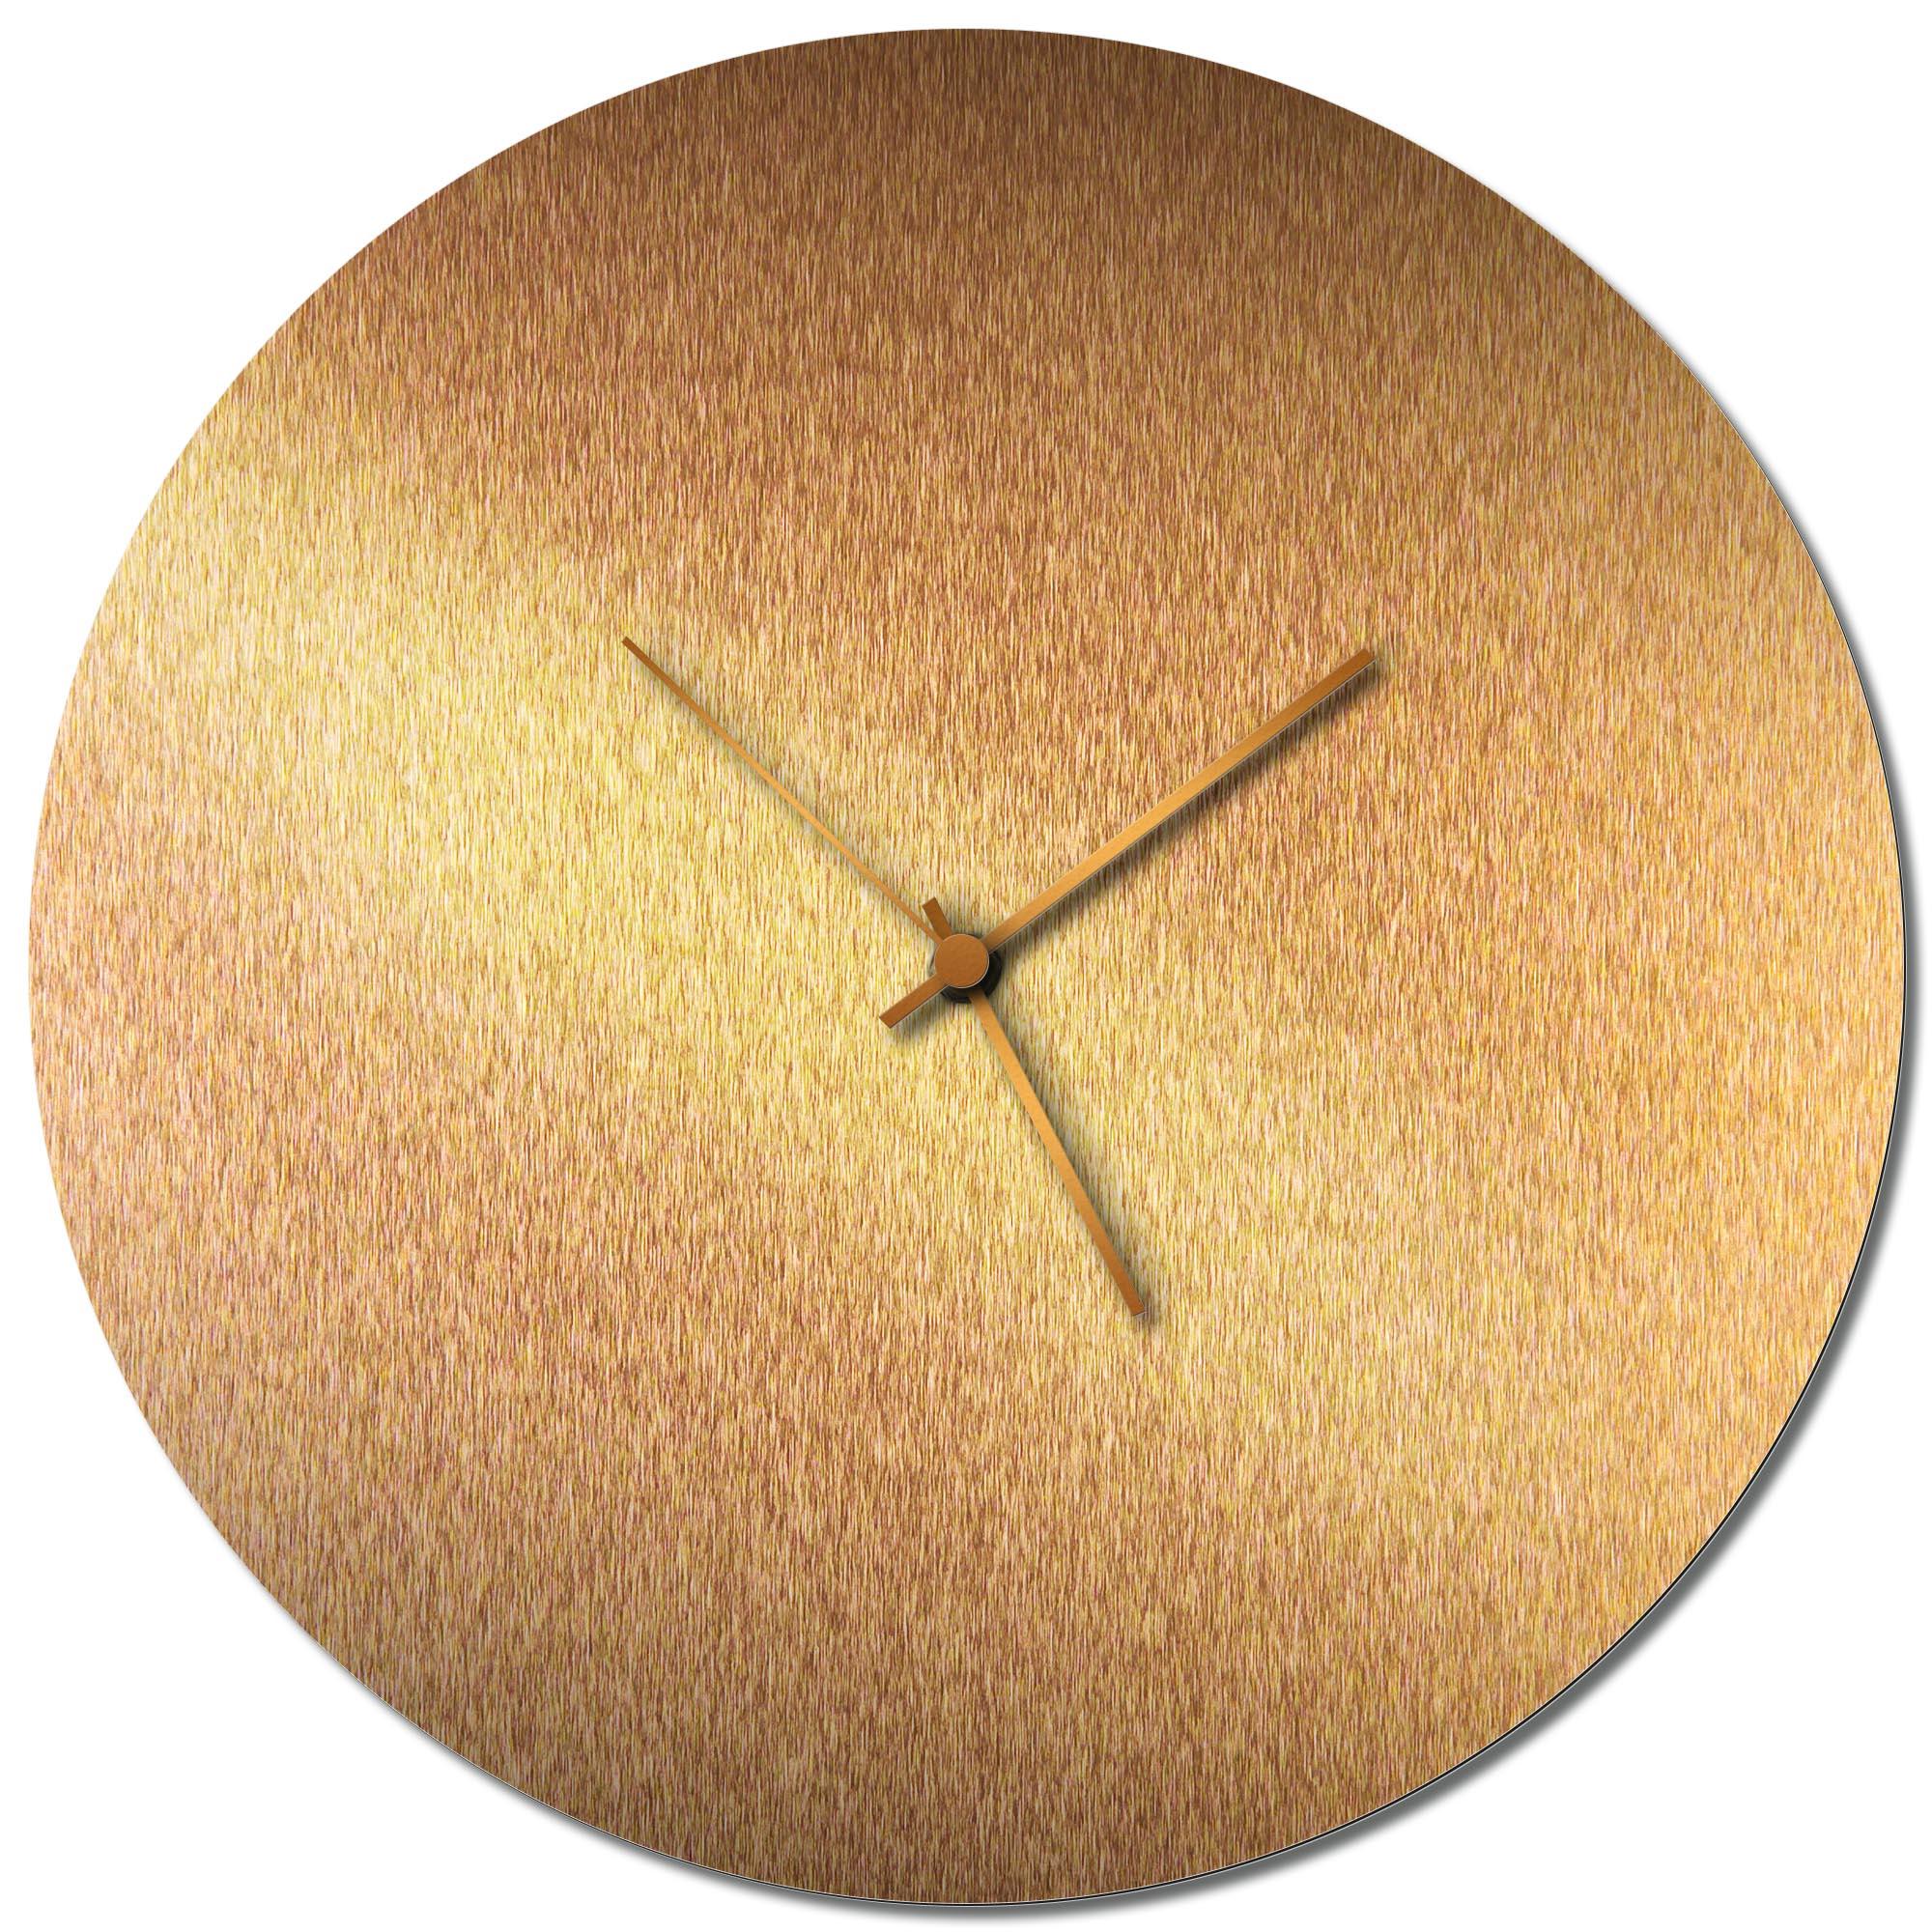 Adam Schwoeppe 'Bronzesmith Circle Clock Bronze' Midcentury Modern Style Wall Clock